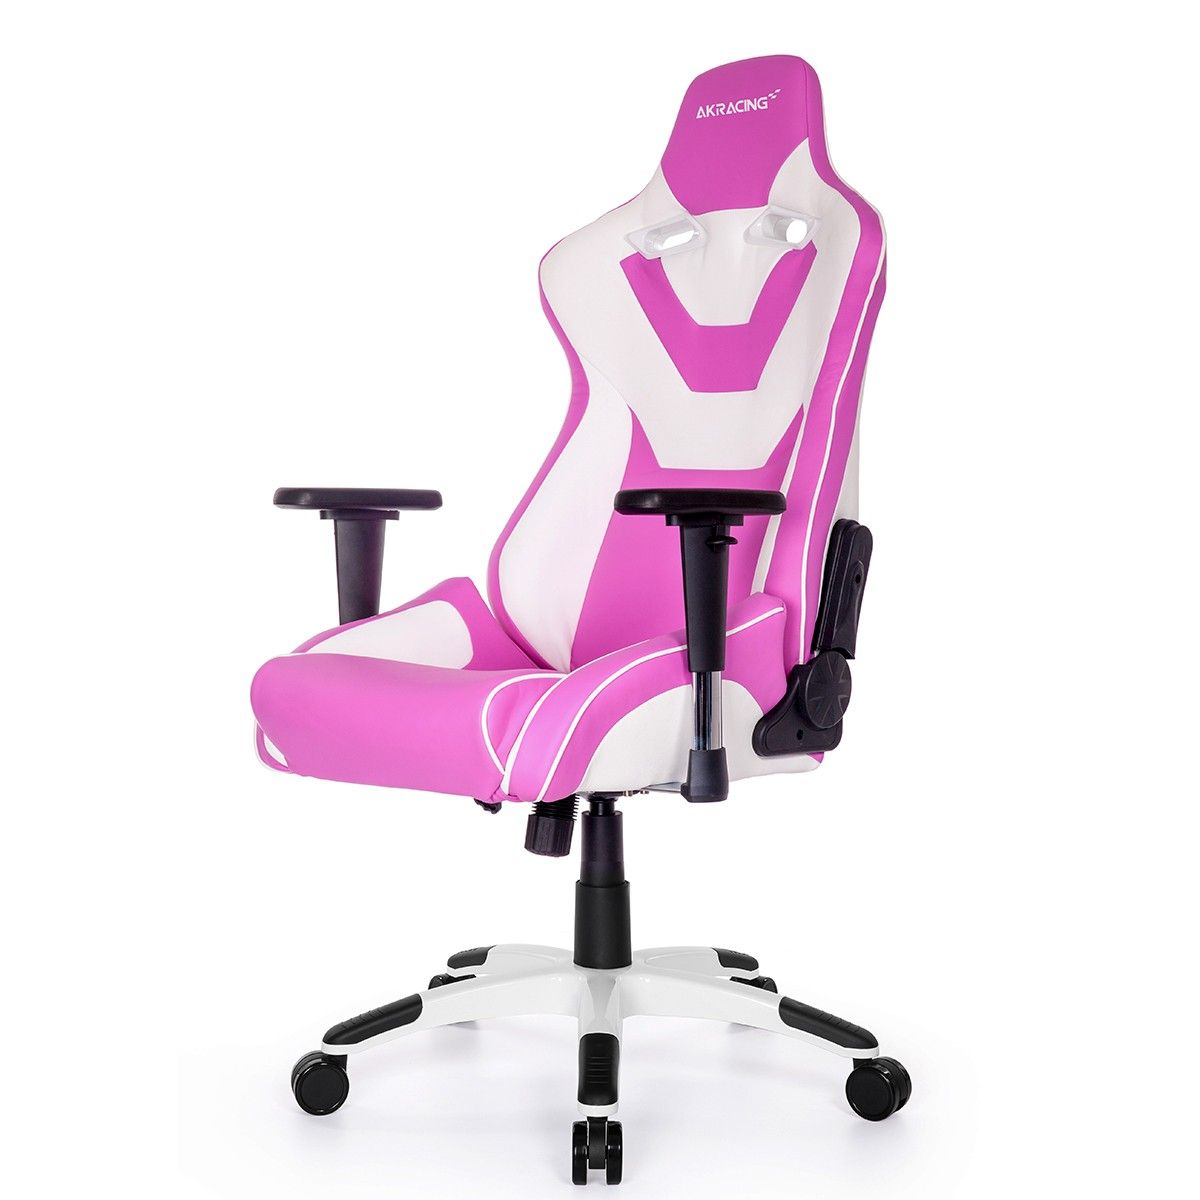 Gaming Chair Akracing Ak Cp Pink And White Versus Gamers Dxracer Racing Series Oh Rv001 Nv Black Violed